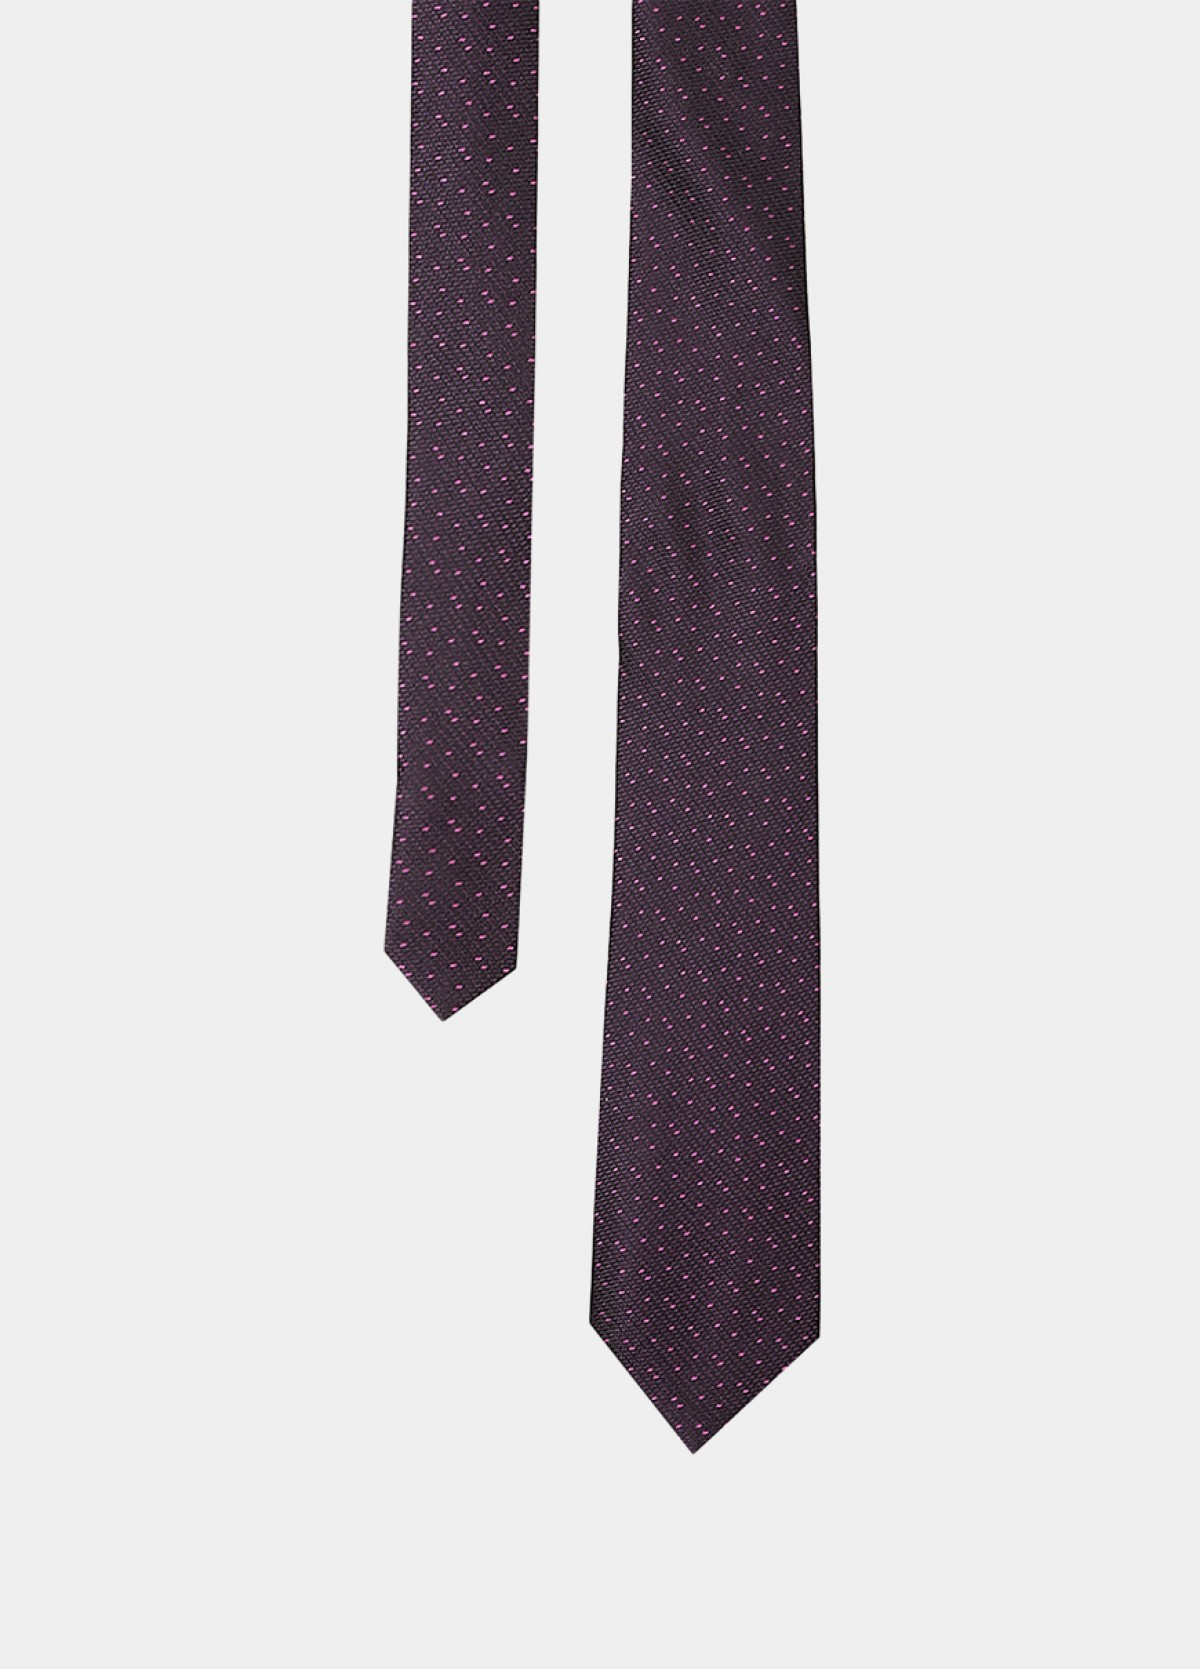 The Purple Silk Tie